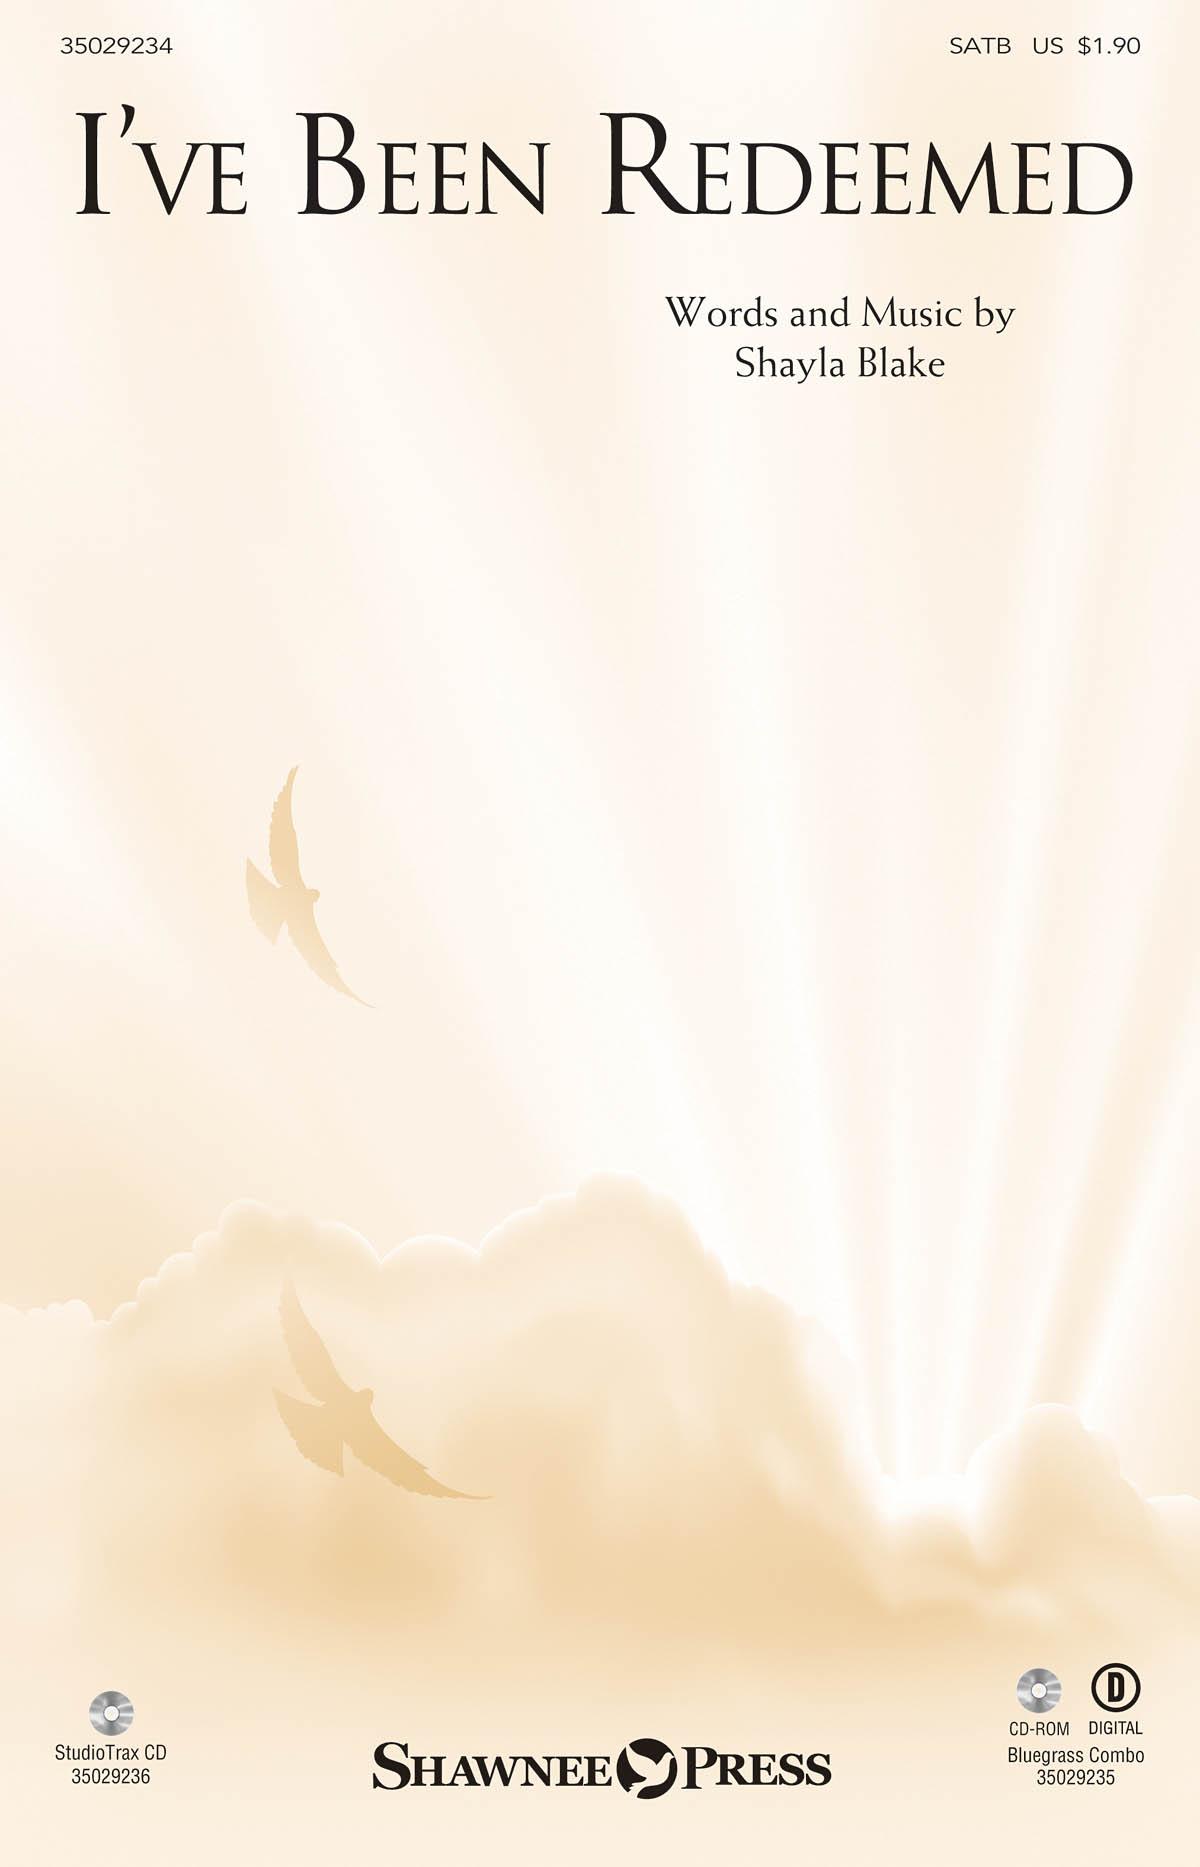 Shayla L. Blake: I've Been Redeemed: SATB: Vocal Score